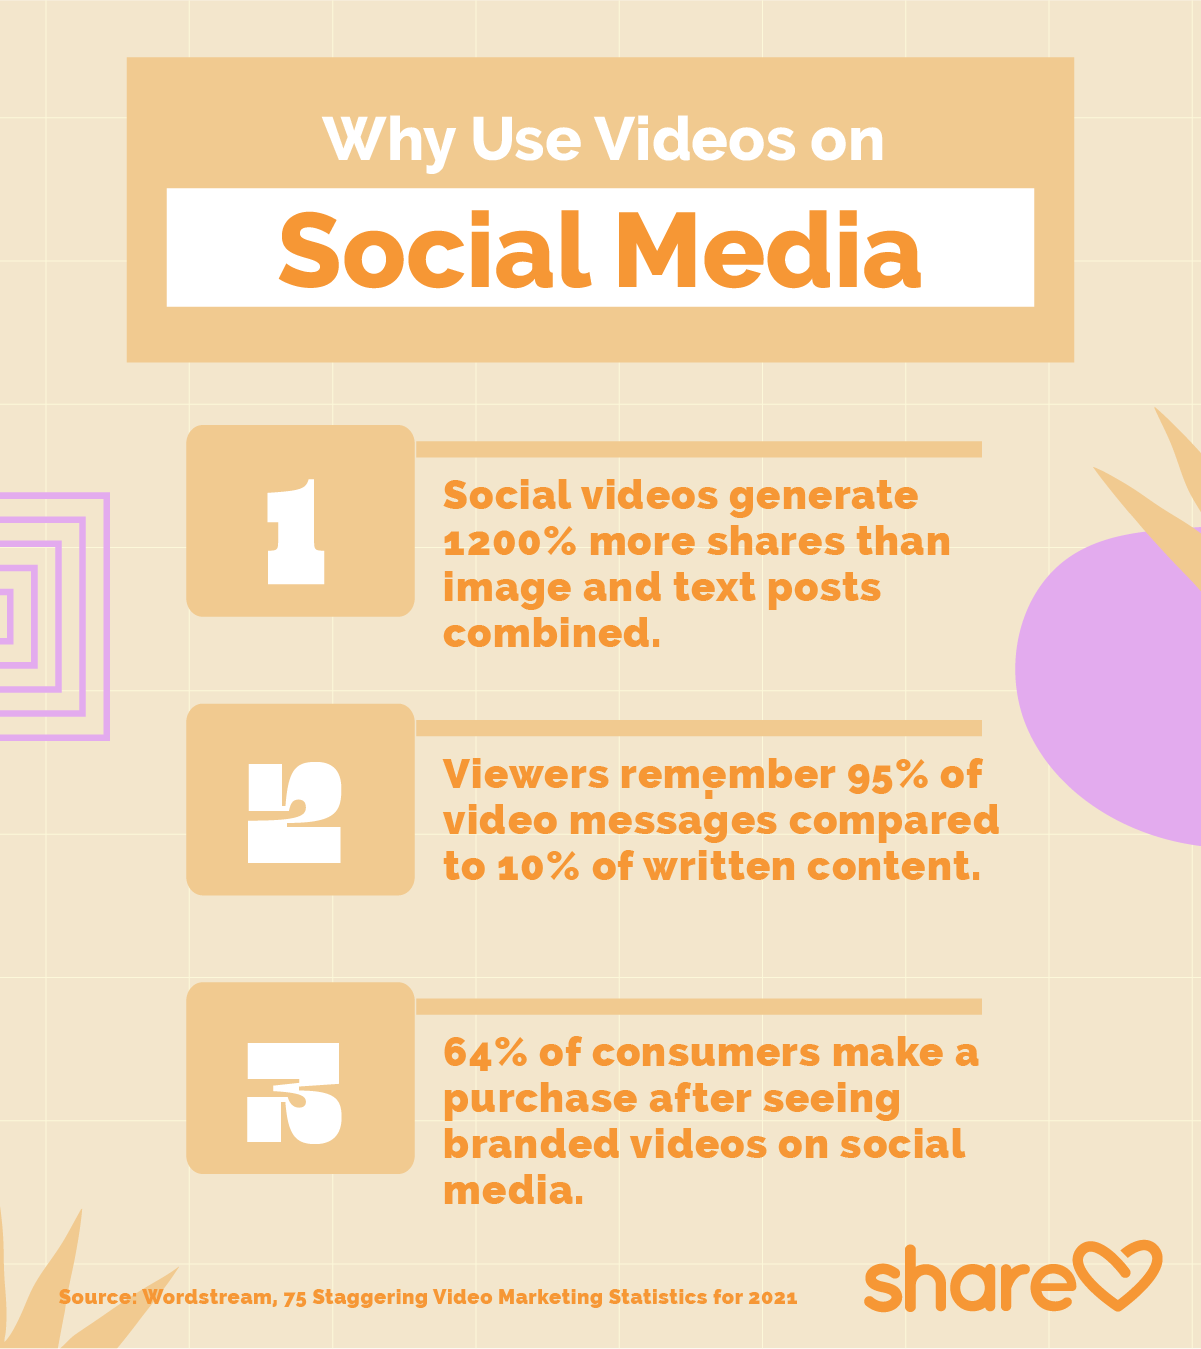 Why Use Videos On Social Media?